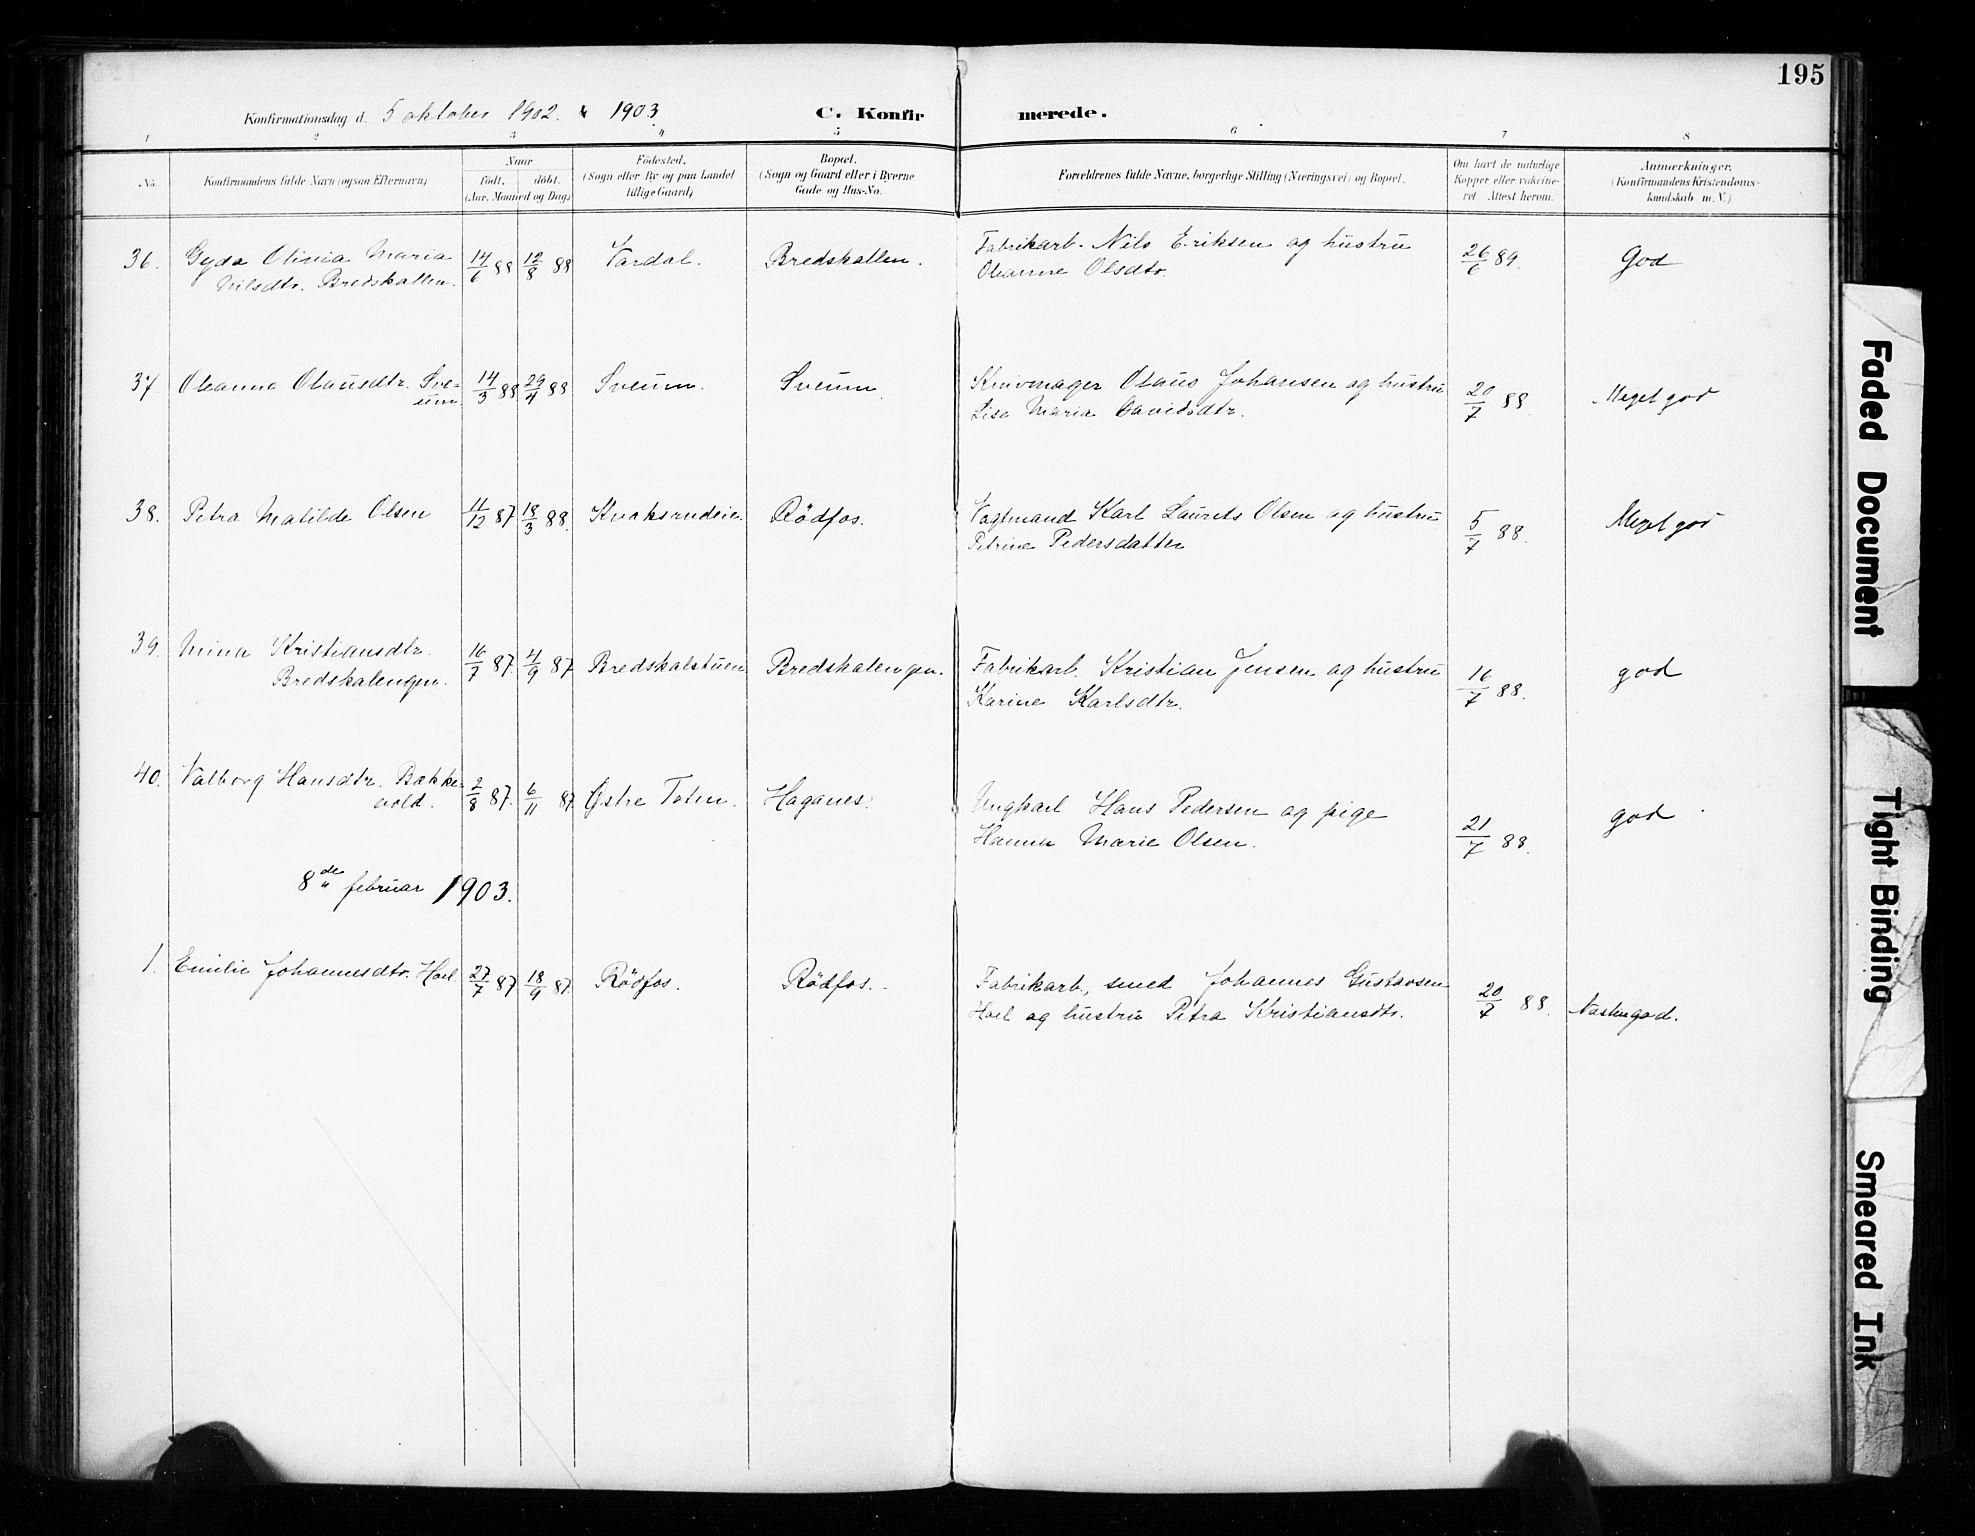 SAH, Vestre Toten prestekontor, H/Ha/Haa/L0011: Ministerialbok nr. 11, 1895-1906, s. 195